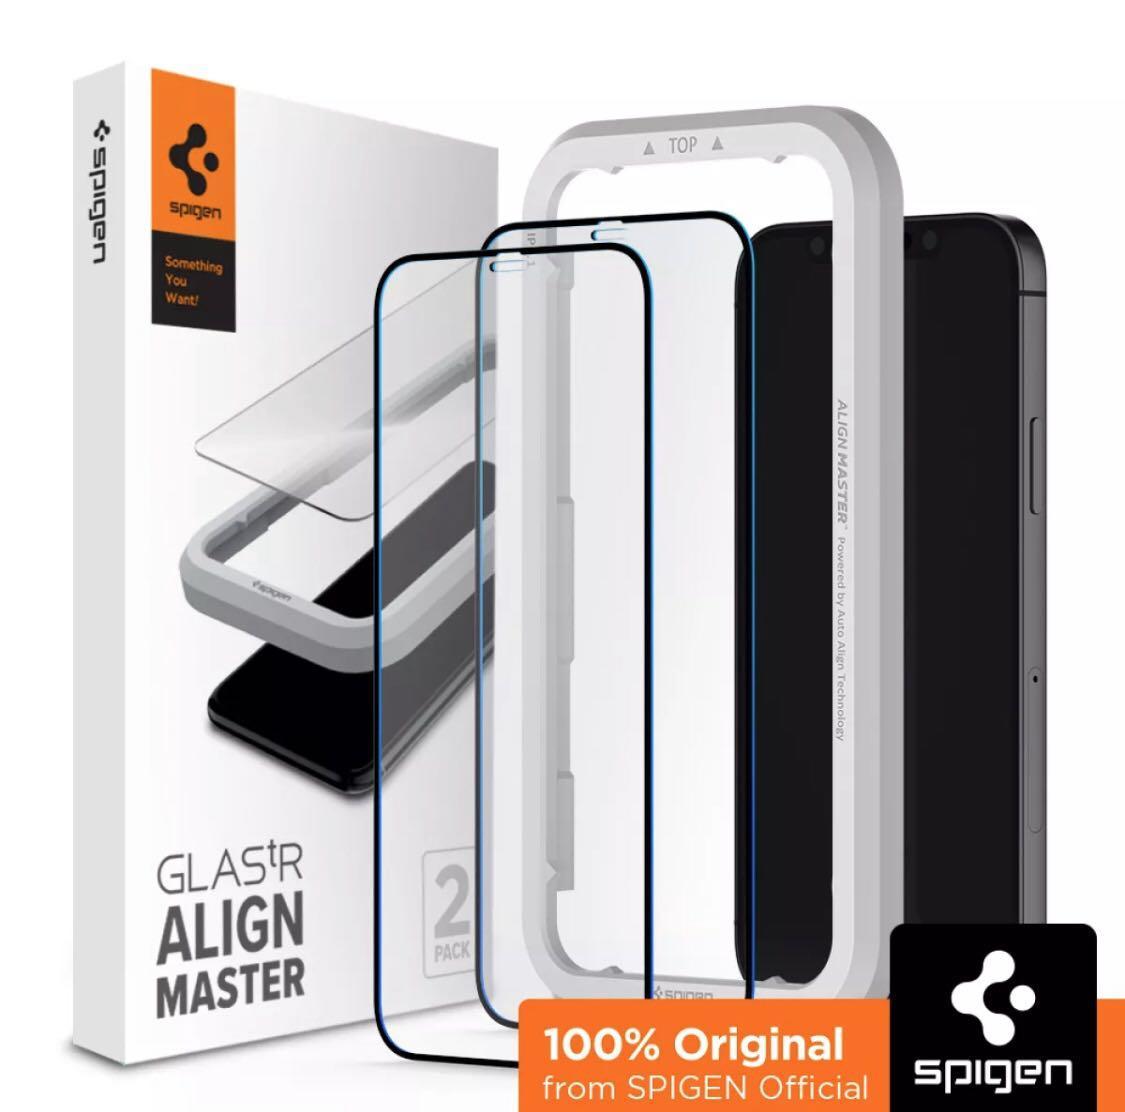 SPIGEN [Align Master, Full Cover] iPhone 12 Screen Protector ...